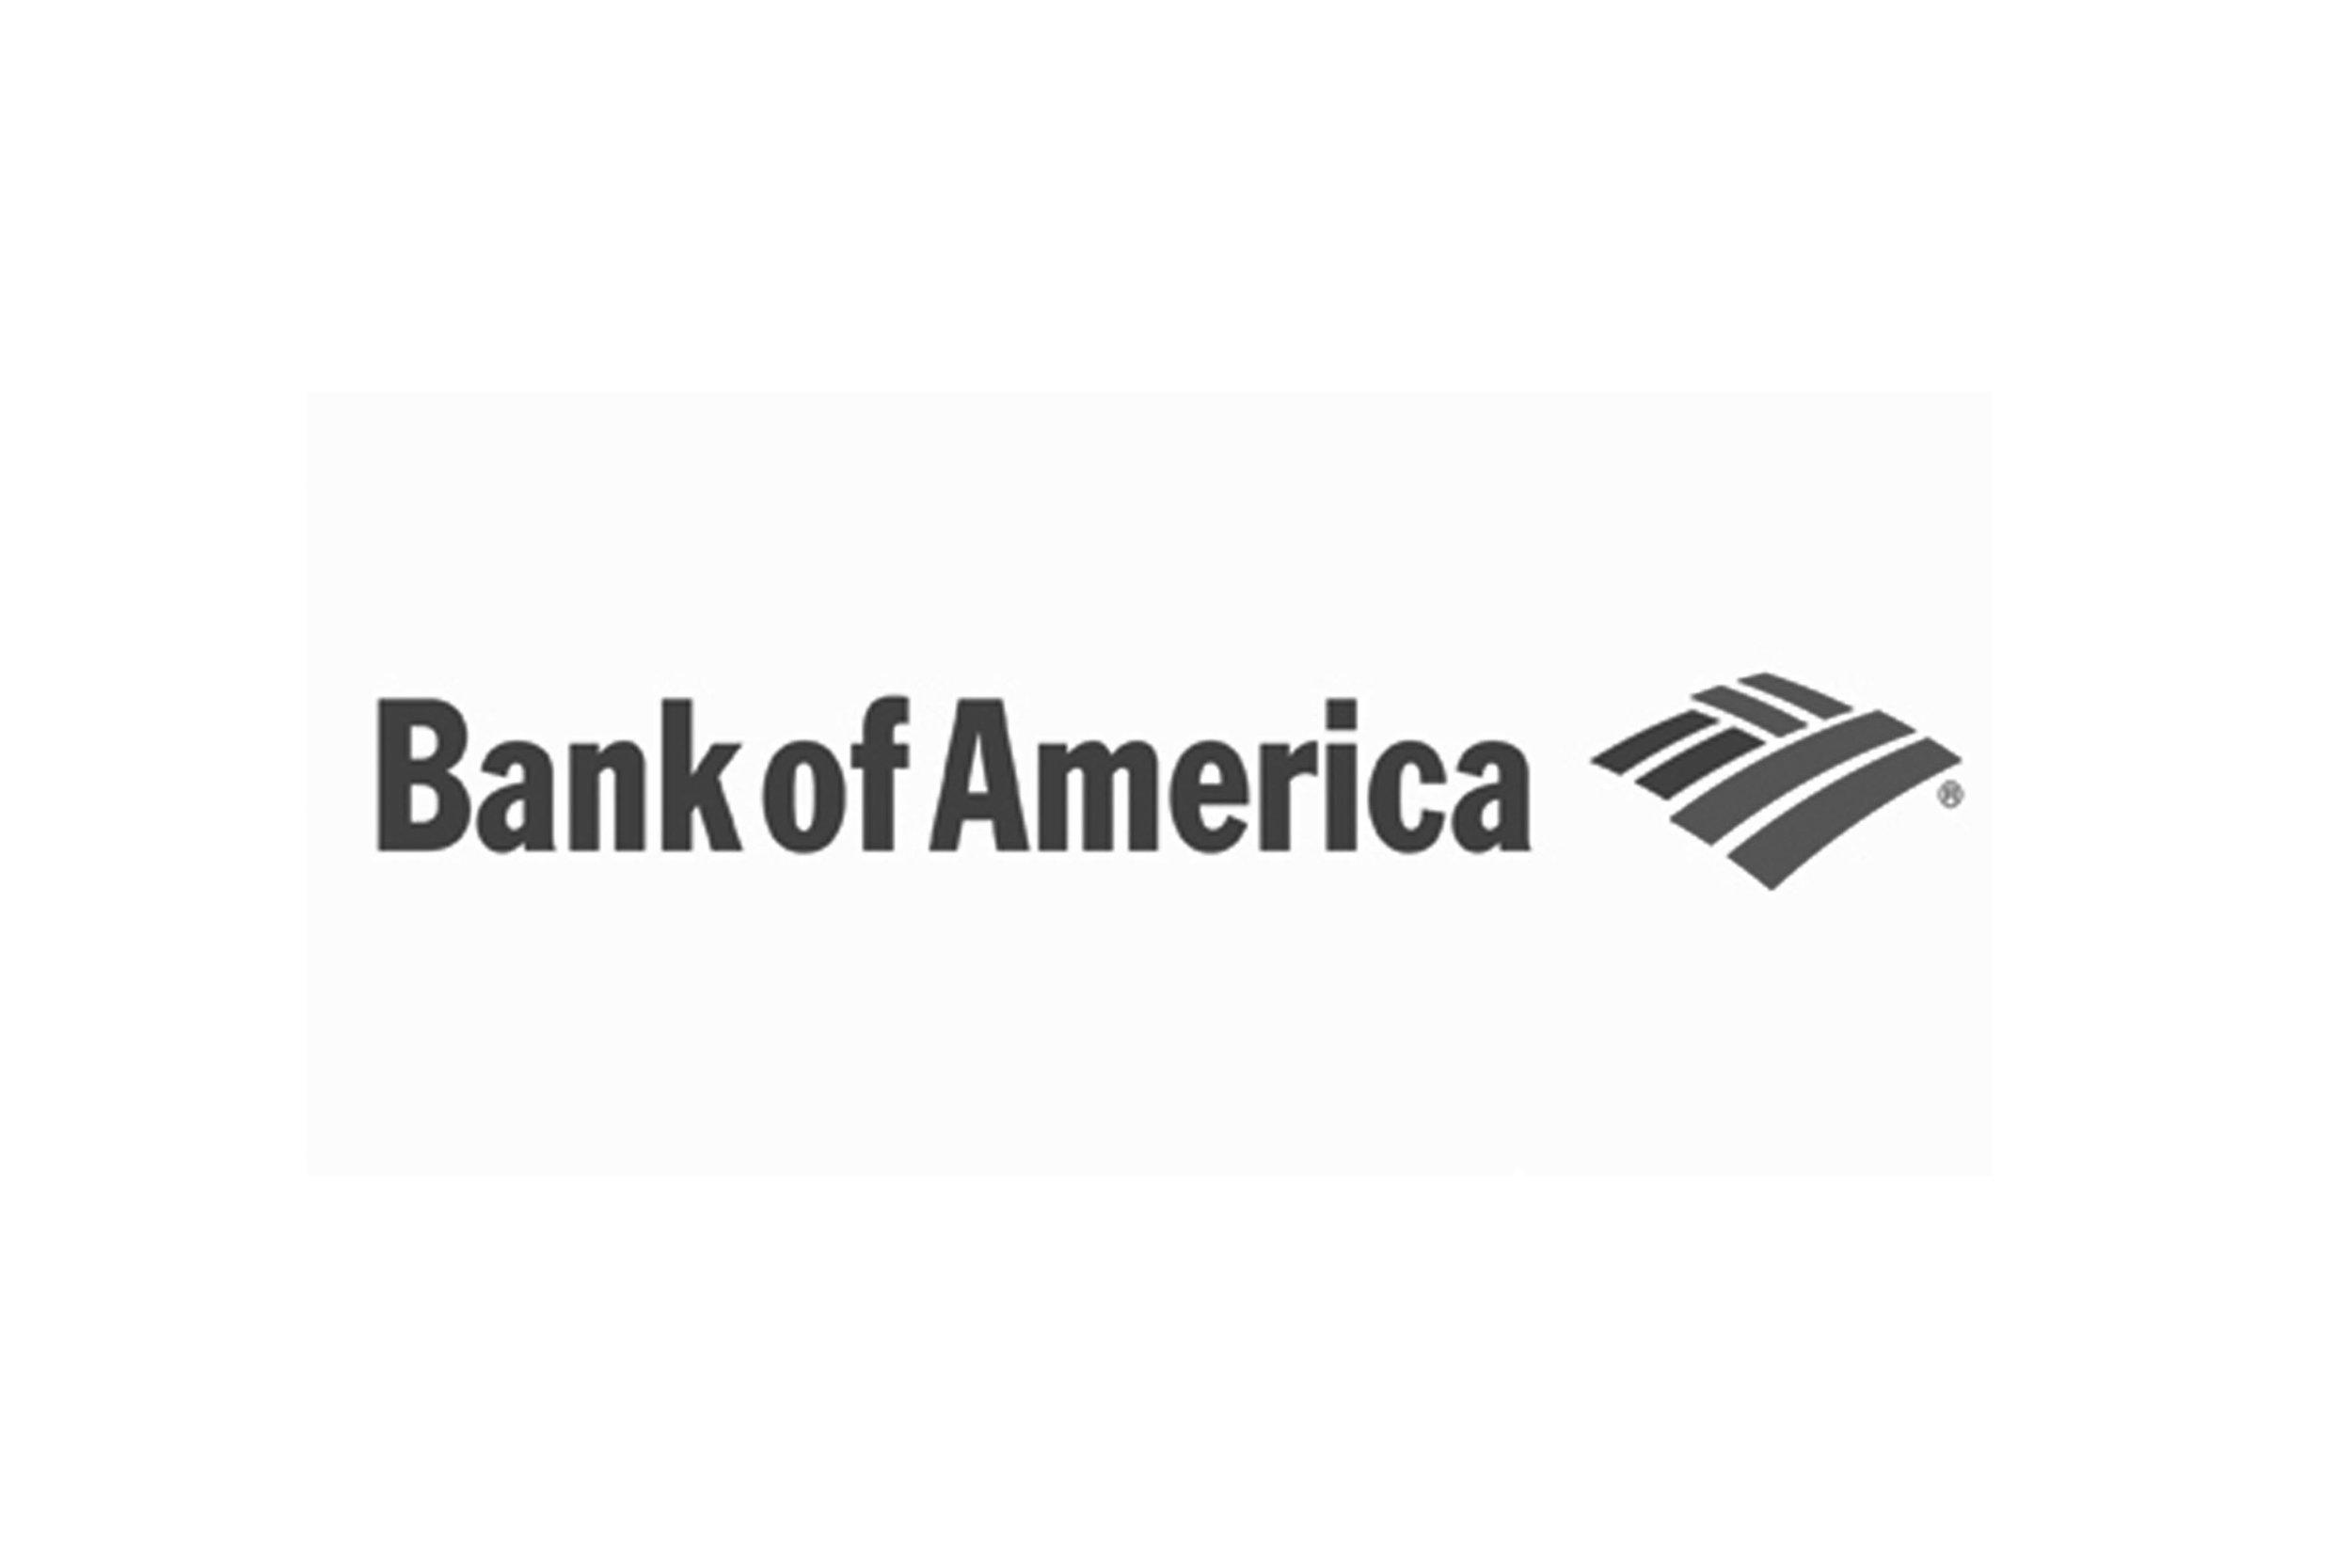 Untitled1_0000s_0026_JEB-ClientLogos_0001s_0026_bank-of-america-logo.jpg.jpg.jpg